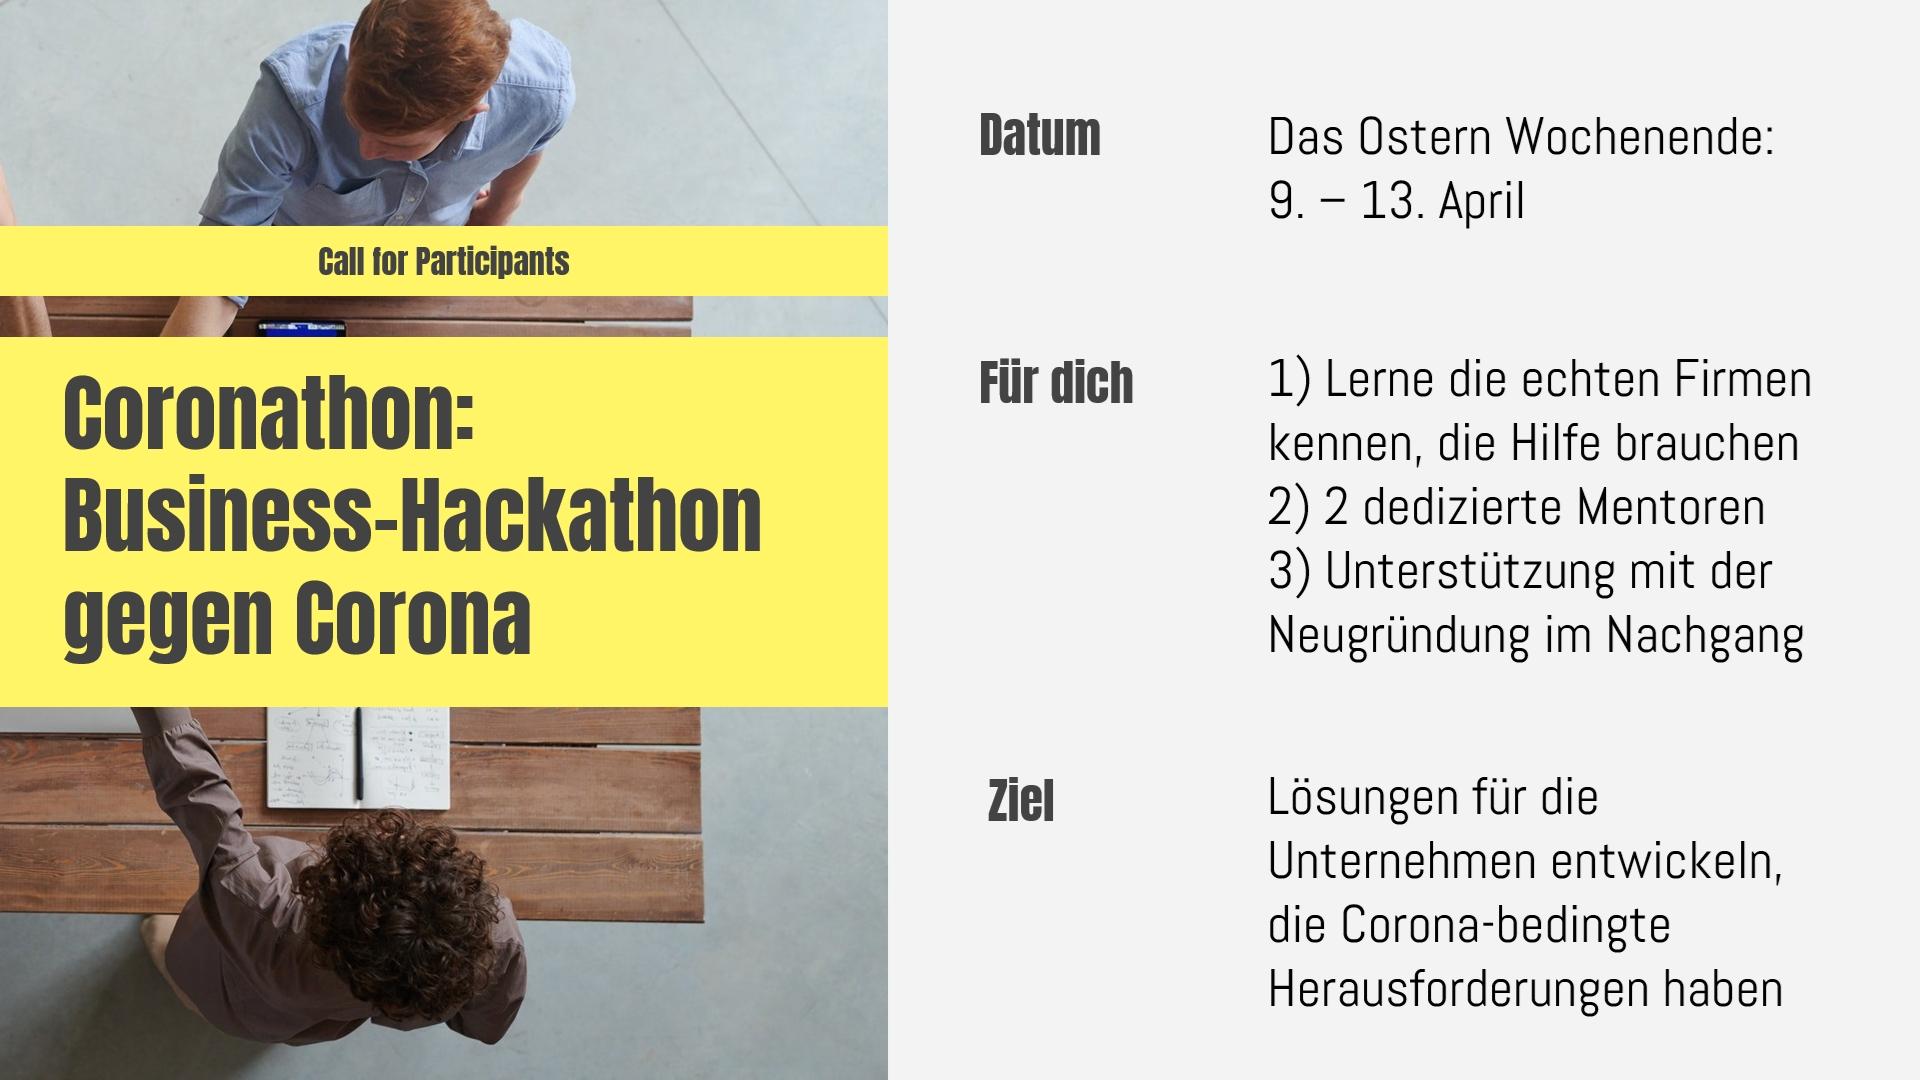 Coronathon: Business-Hackathon gegen Corona